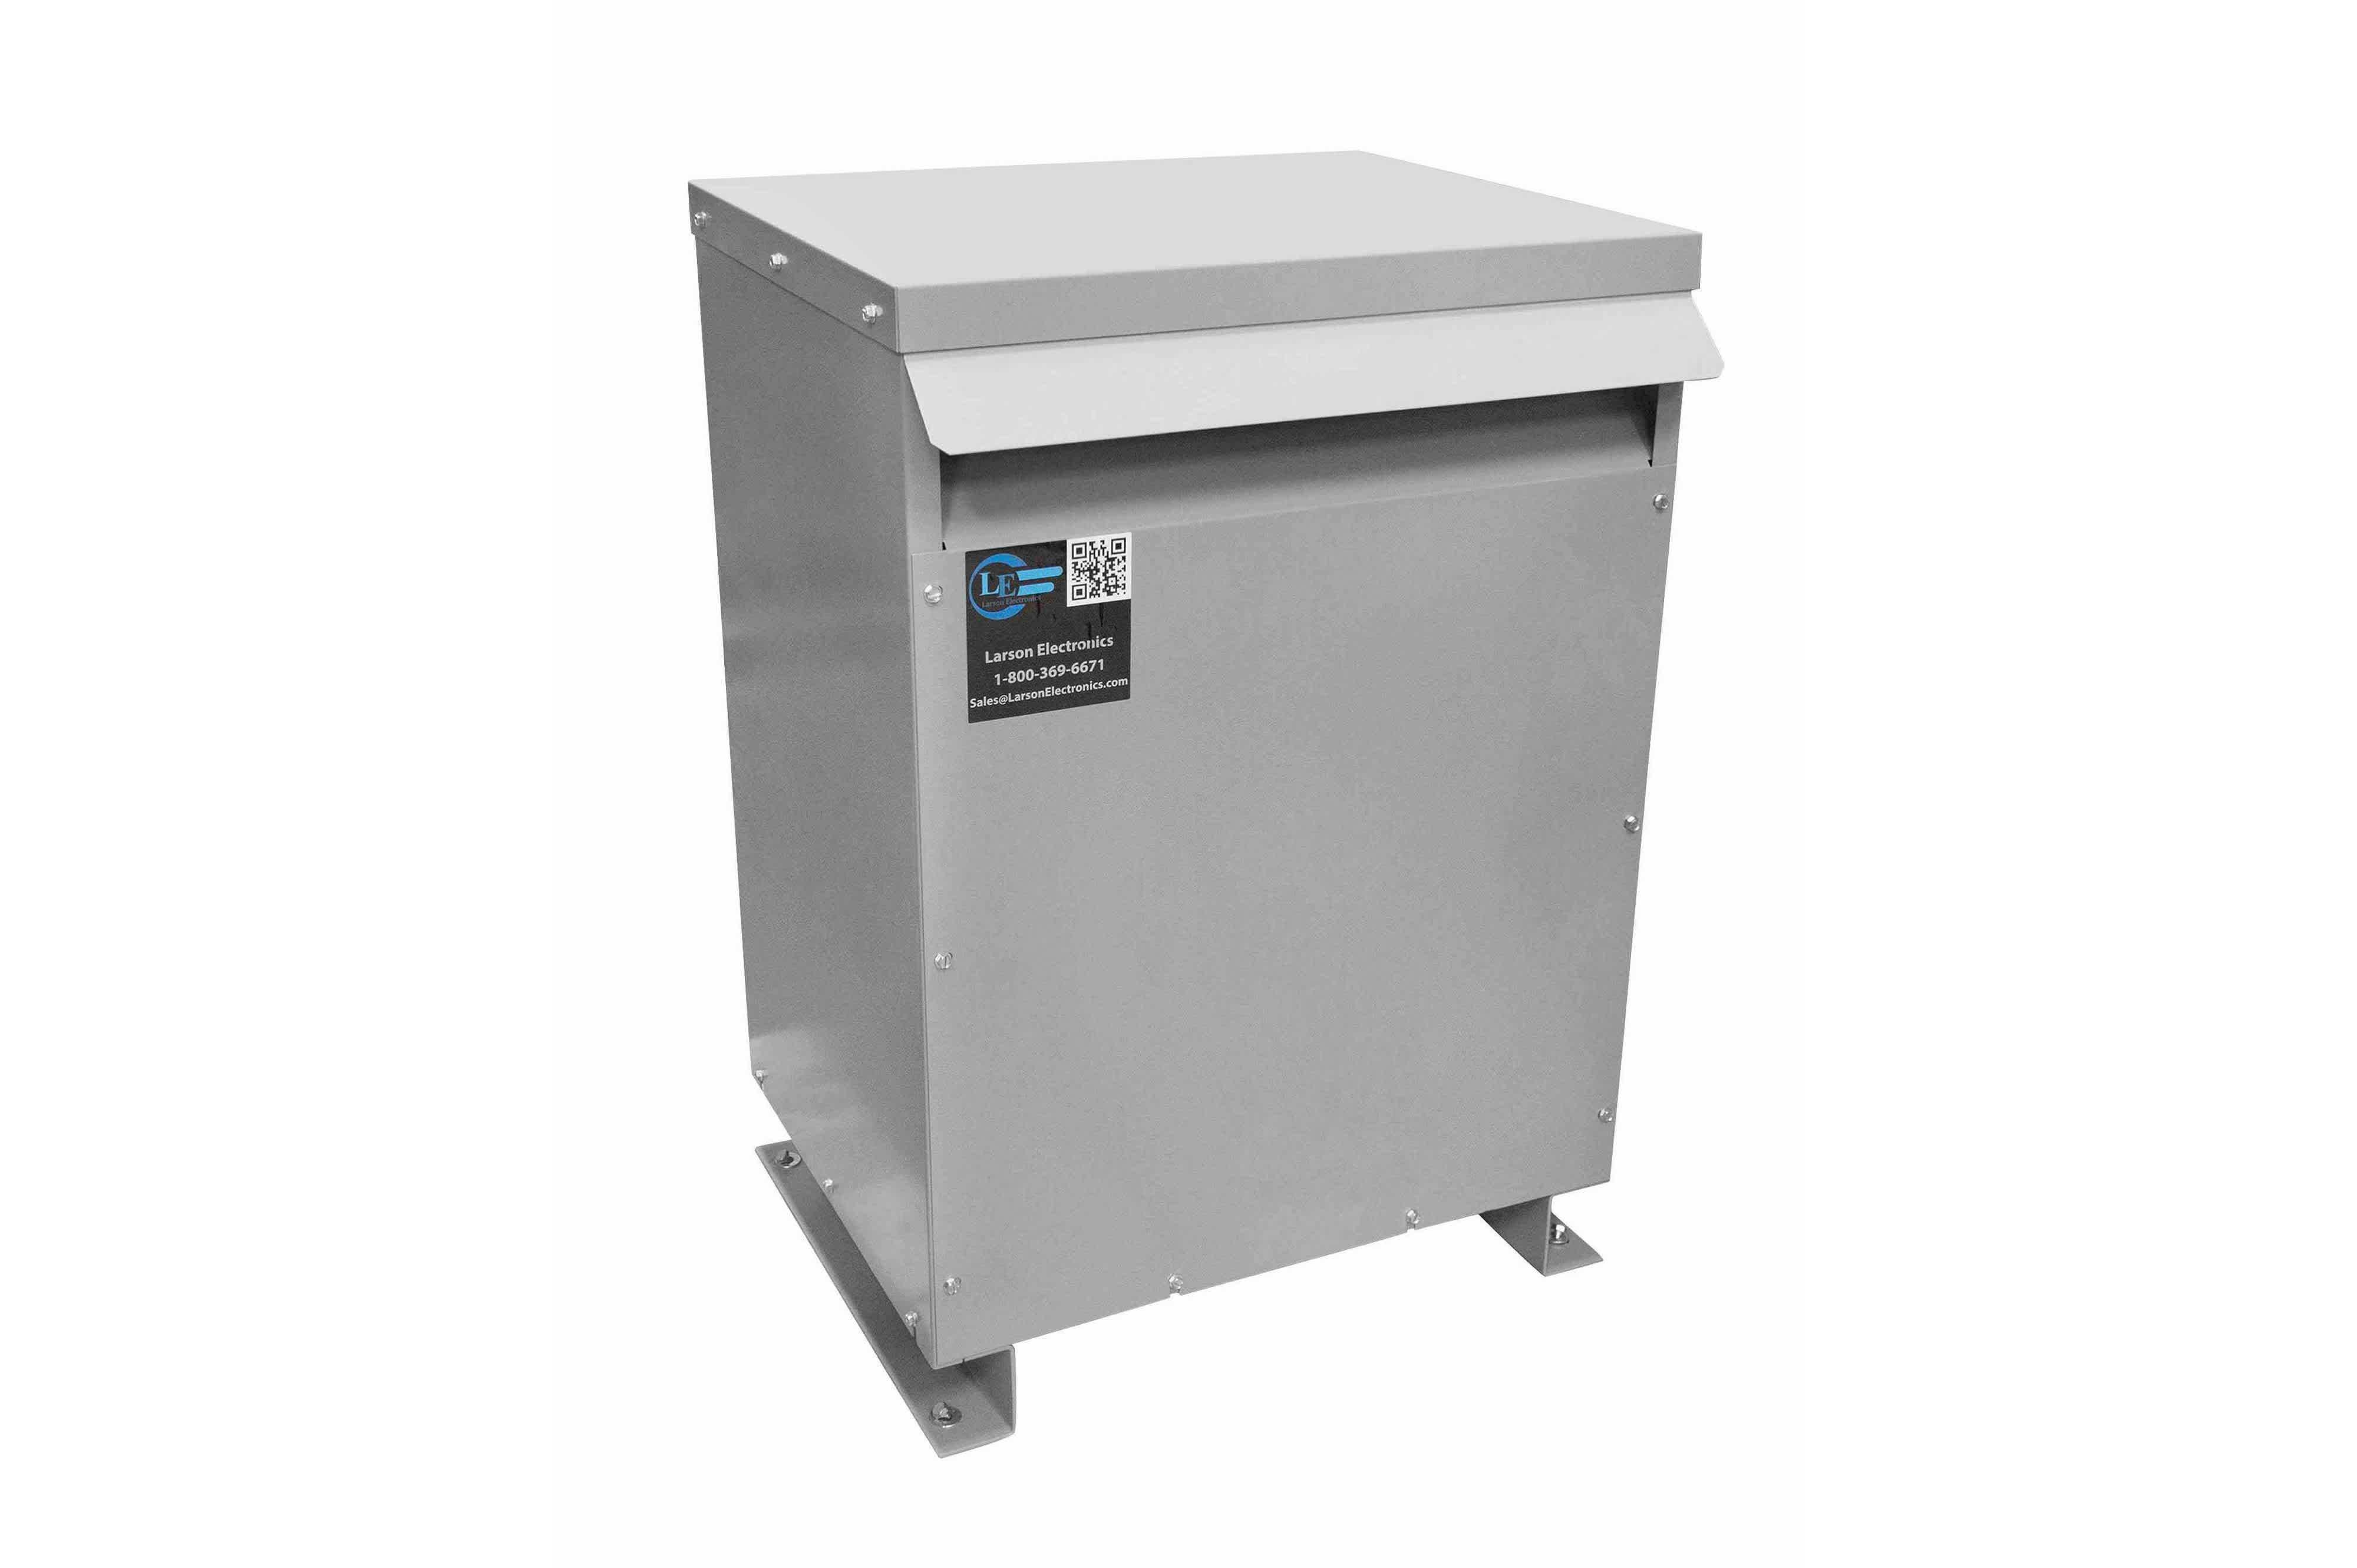 275 kVA 3PH Isolation Transformer, 208V Wye Primary, 208Y/120 Wye-N Secondary, N3R, Ventilated, 60 Hz